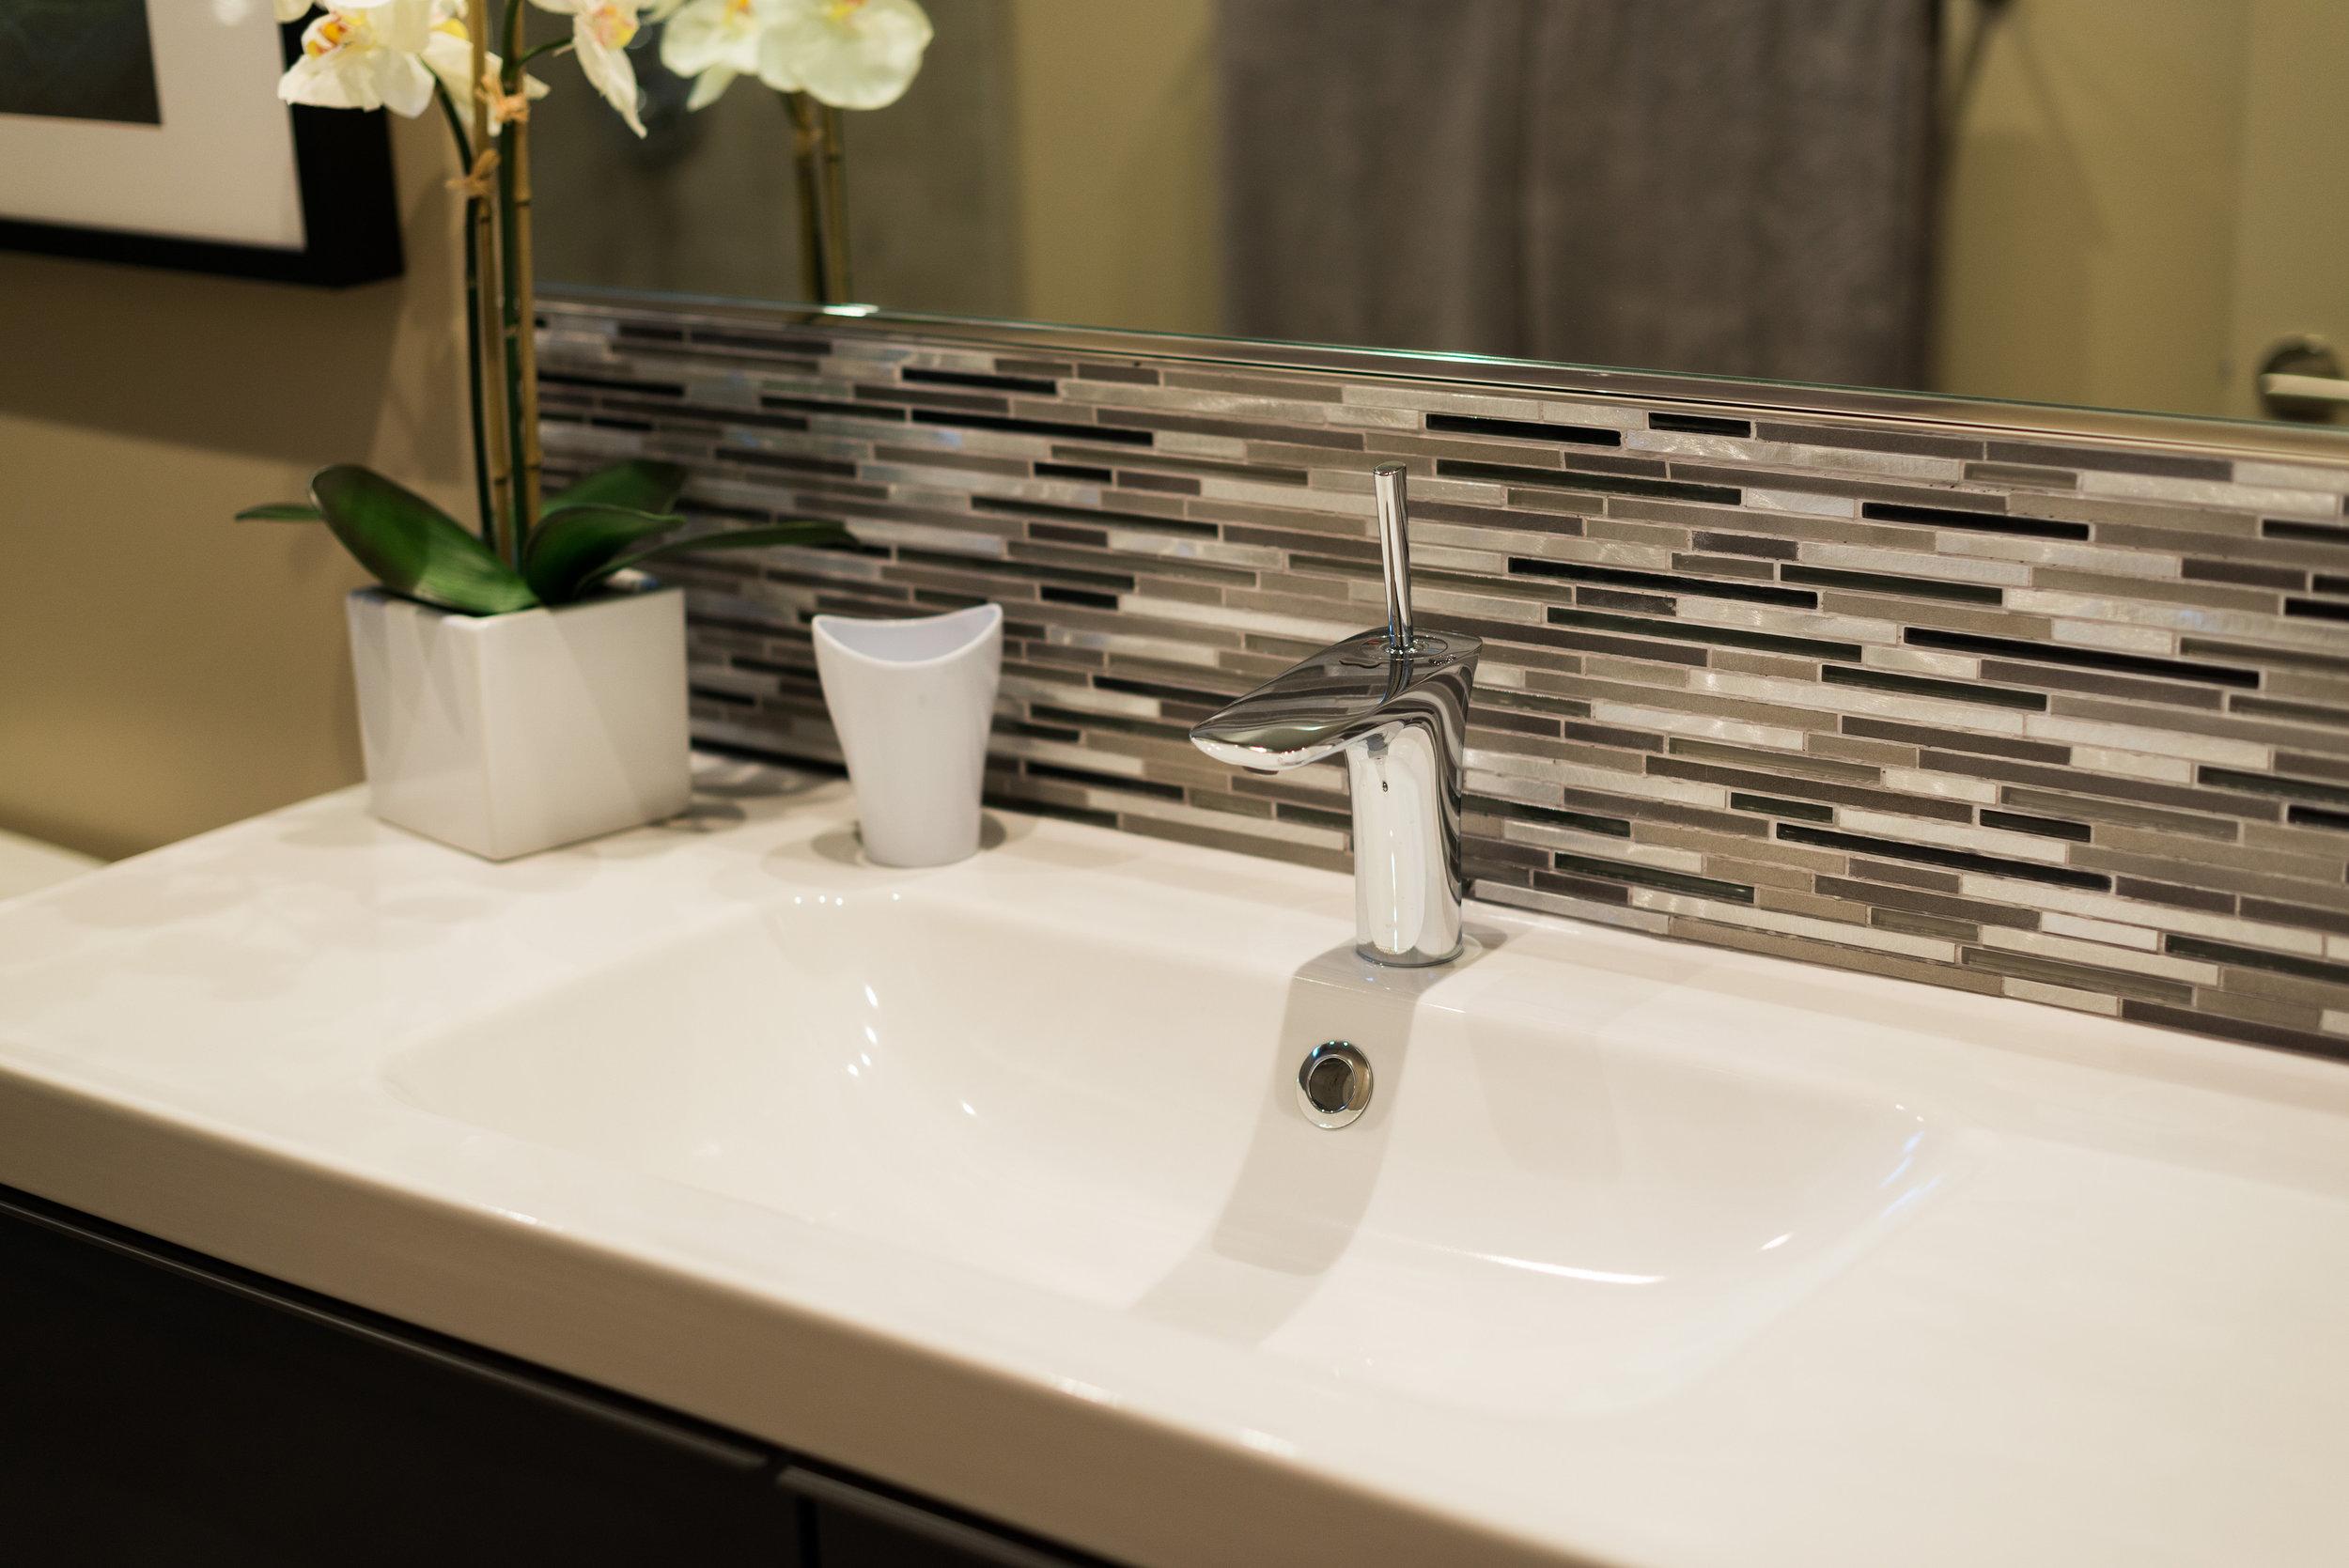 Bathroom Sink and Backsplash